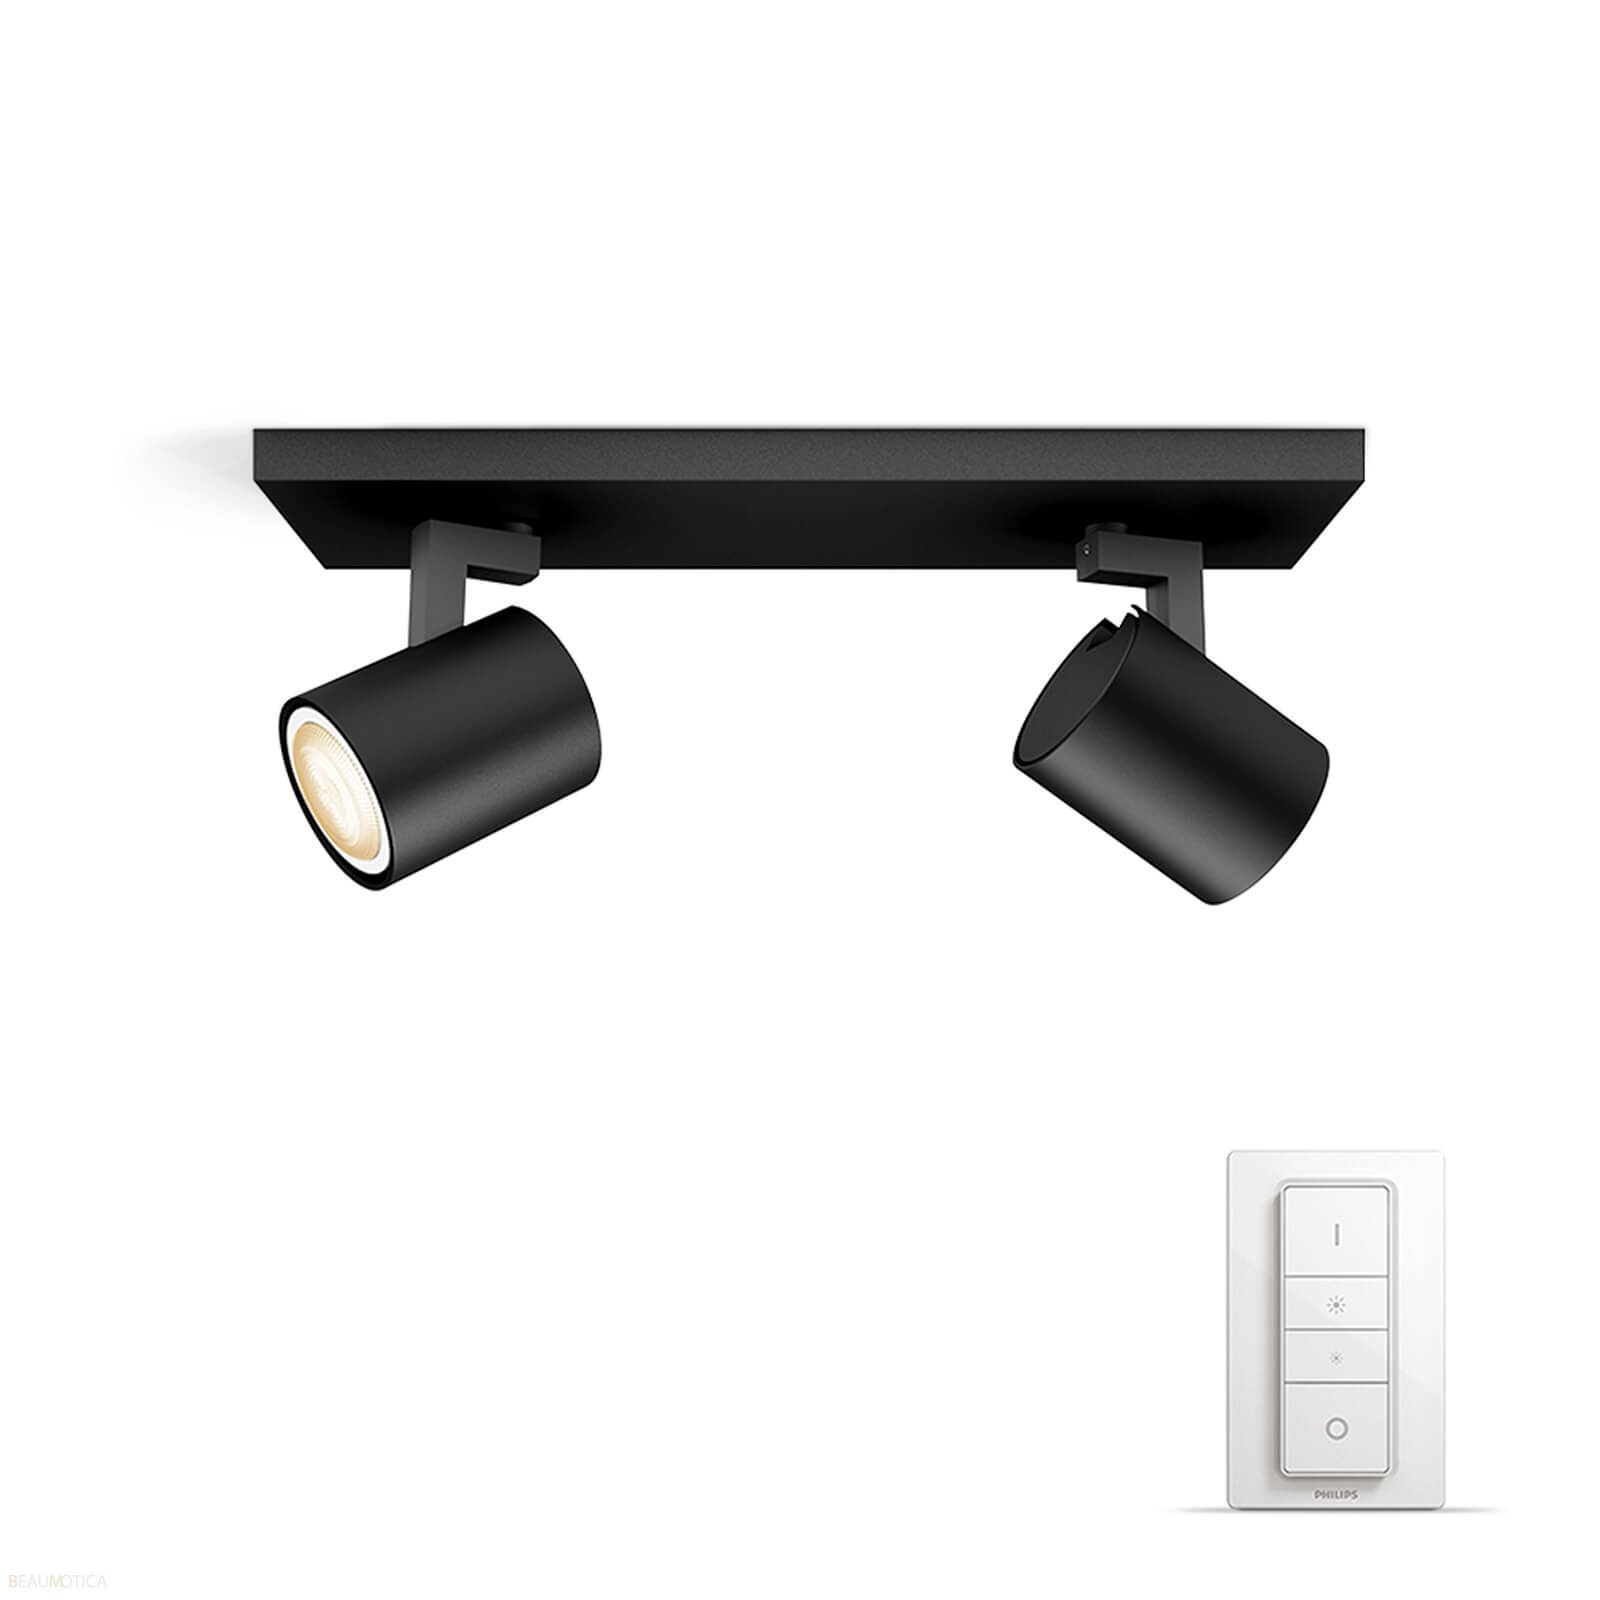 philips hue runner 2 spot zwart white ambiance incl dim switch. Black Bedroom Furniture Sets. Home Design Ideas